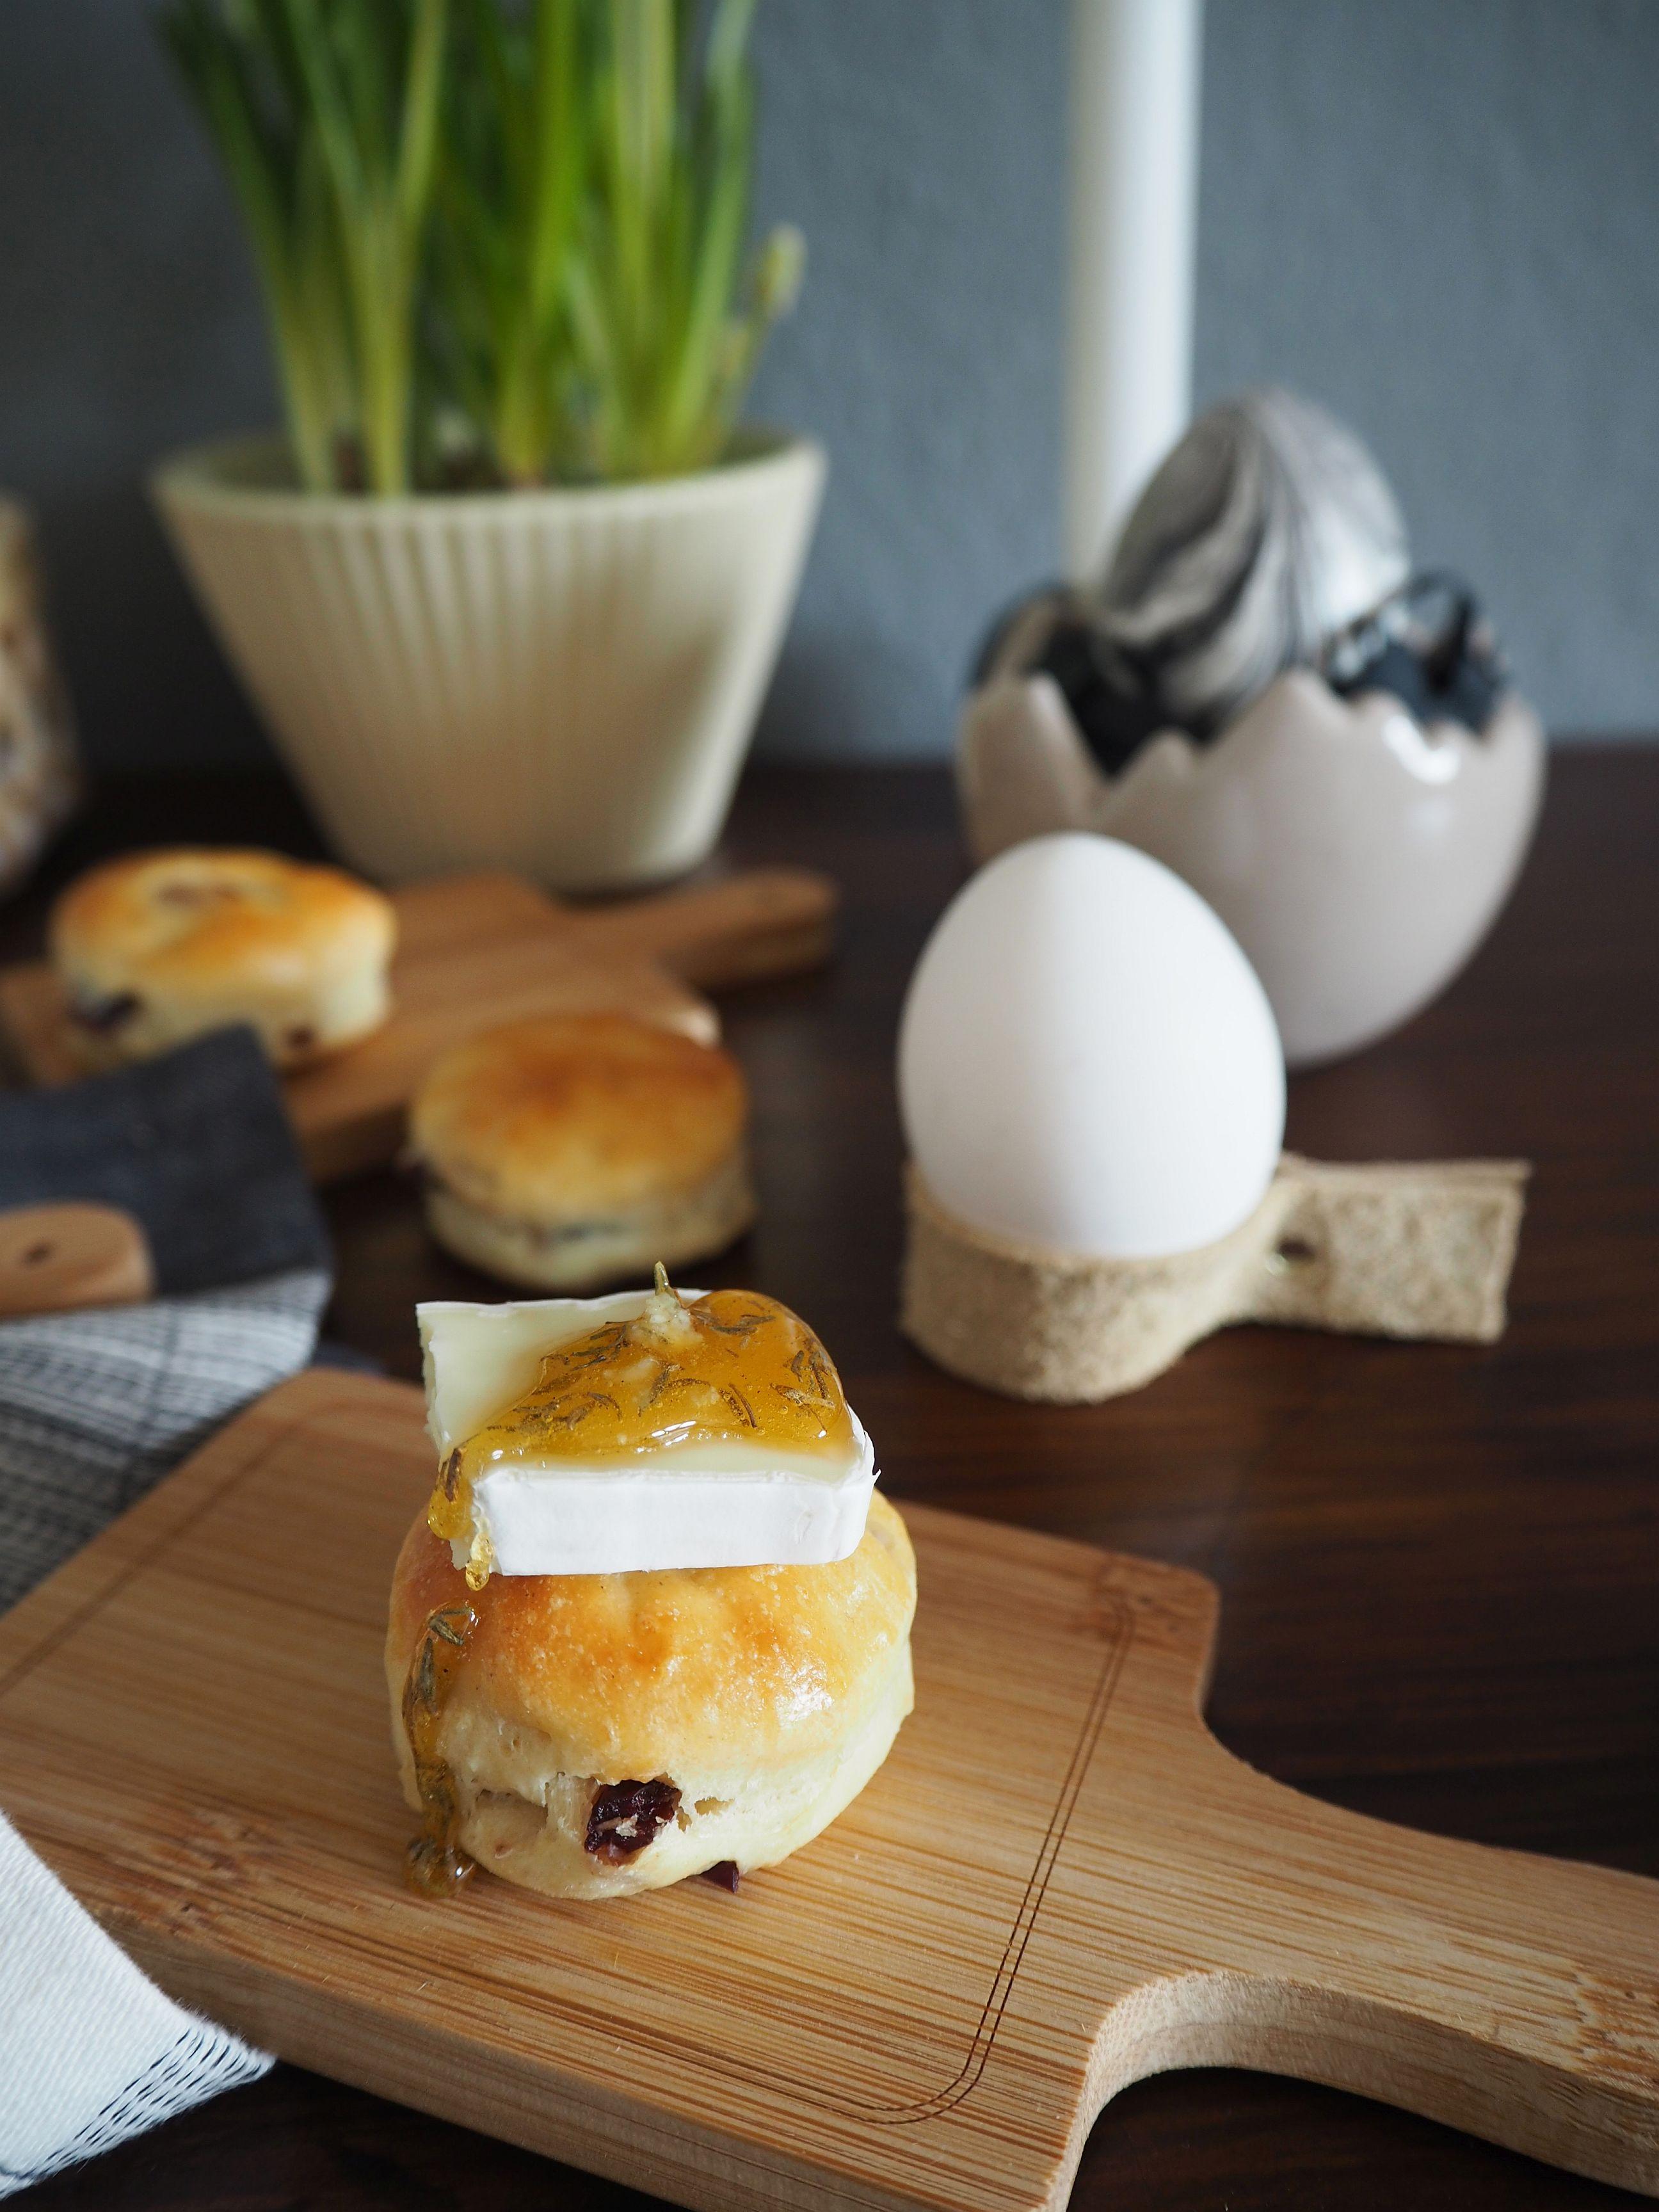 2018-03-skoen-och-kreativ-food-glad-pask-cranberry-mandel-broetchen-ostern (3)